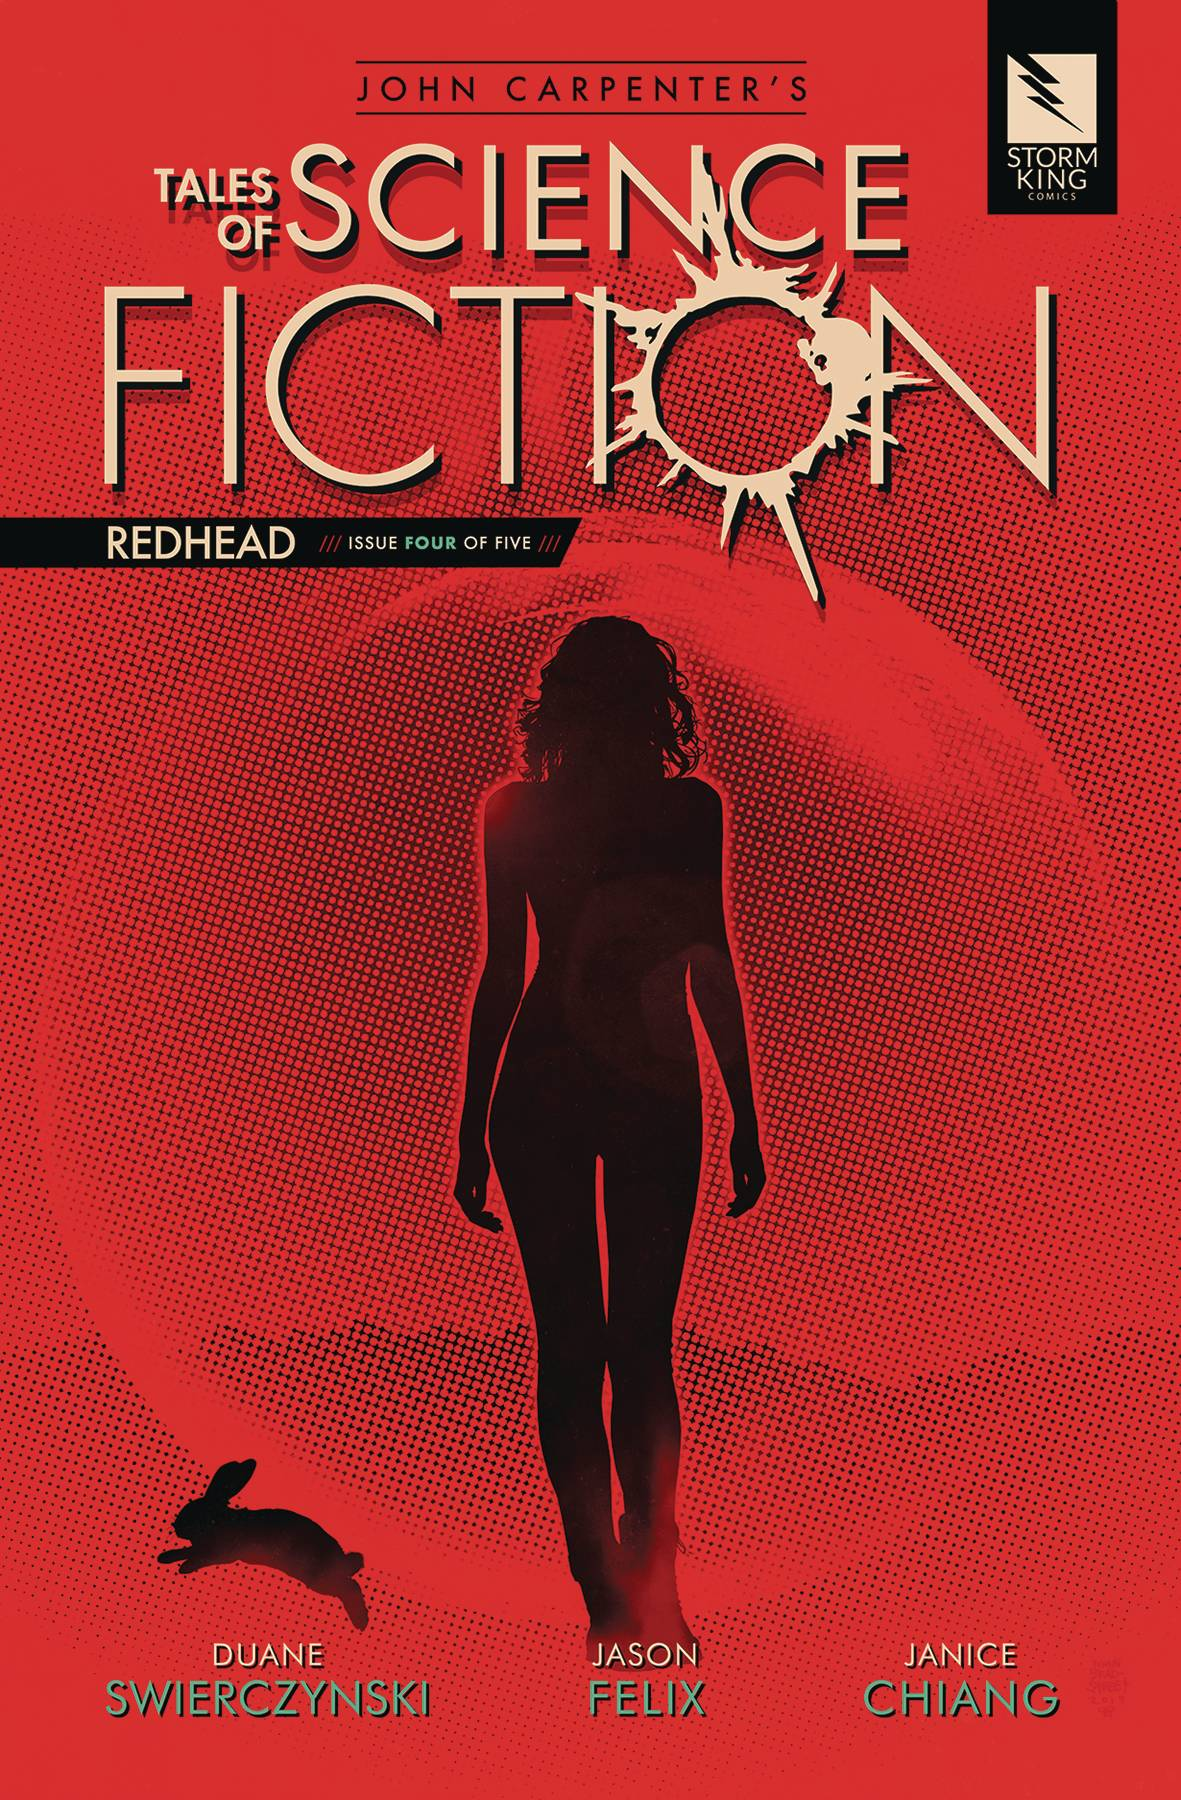 John Carpenter's Tales Science Fiction: Redhead #4 (2020)